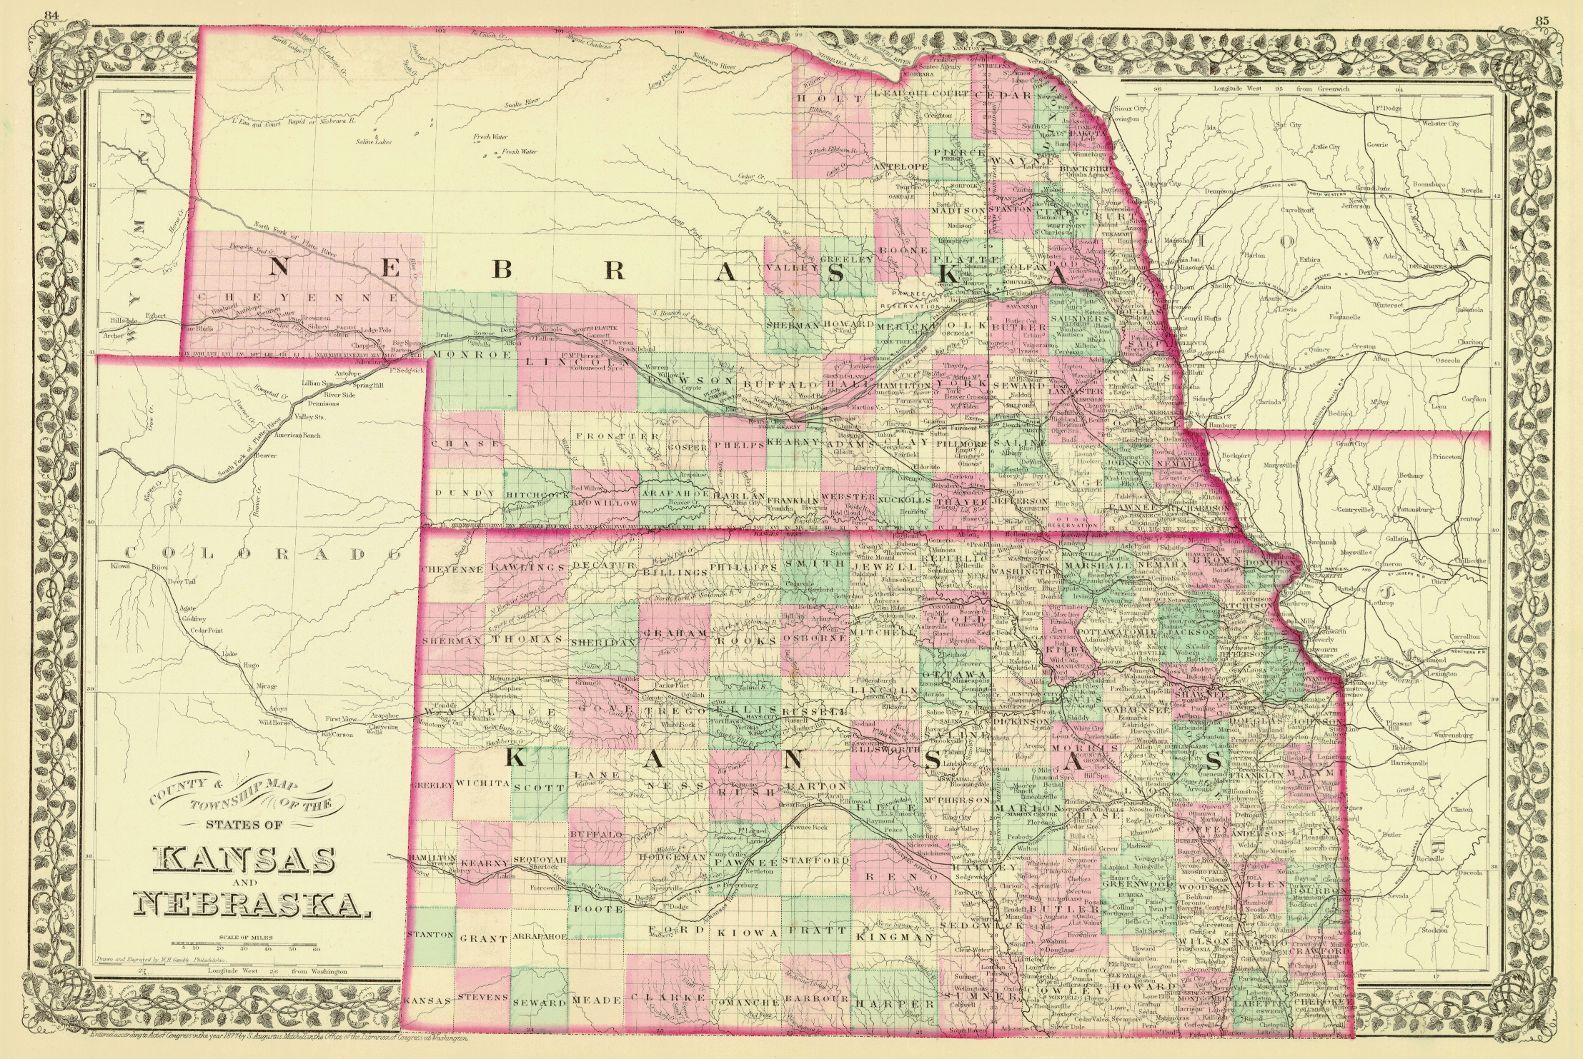 map of nebraska and kansas Map Antique County Township Map Of The States Of Kansas And map of nebraska and kansas